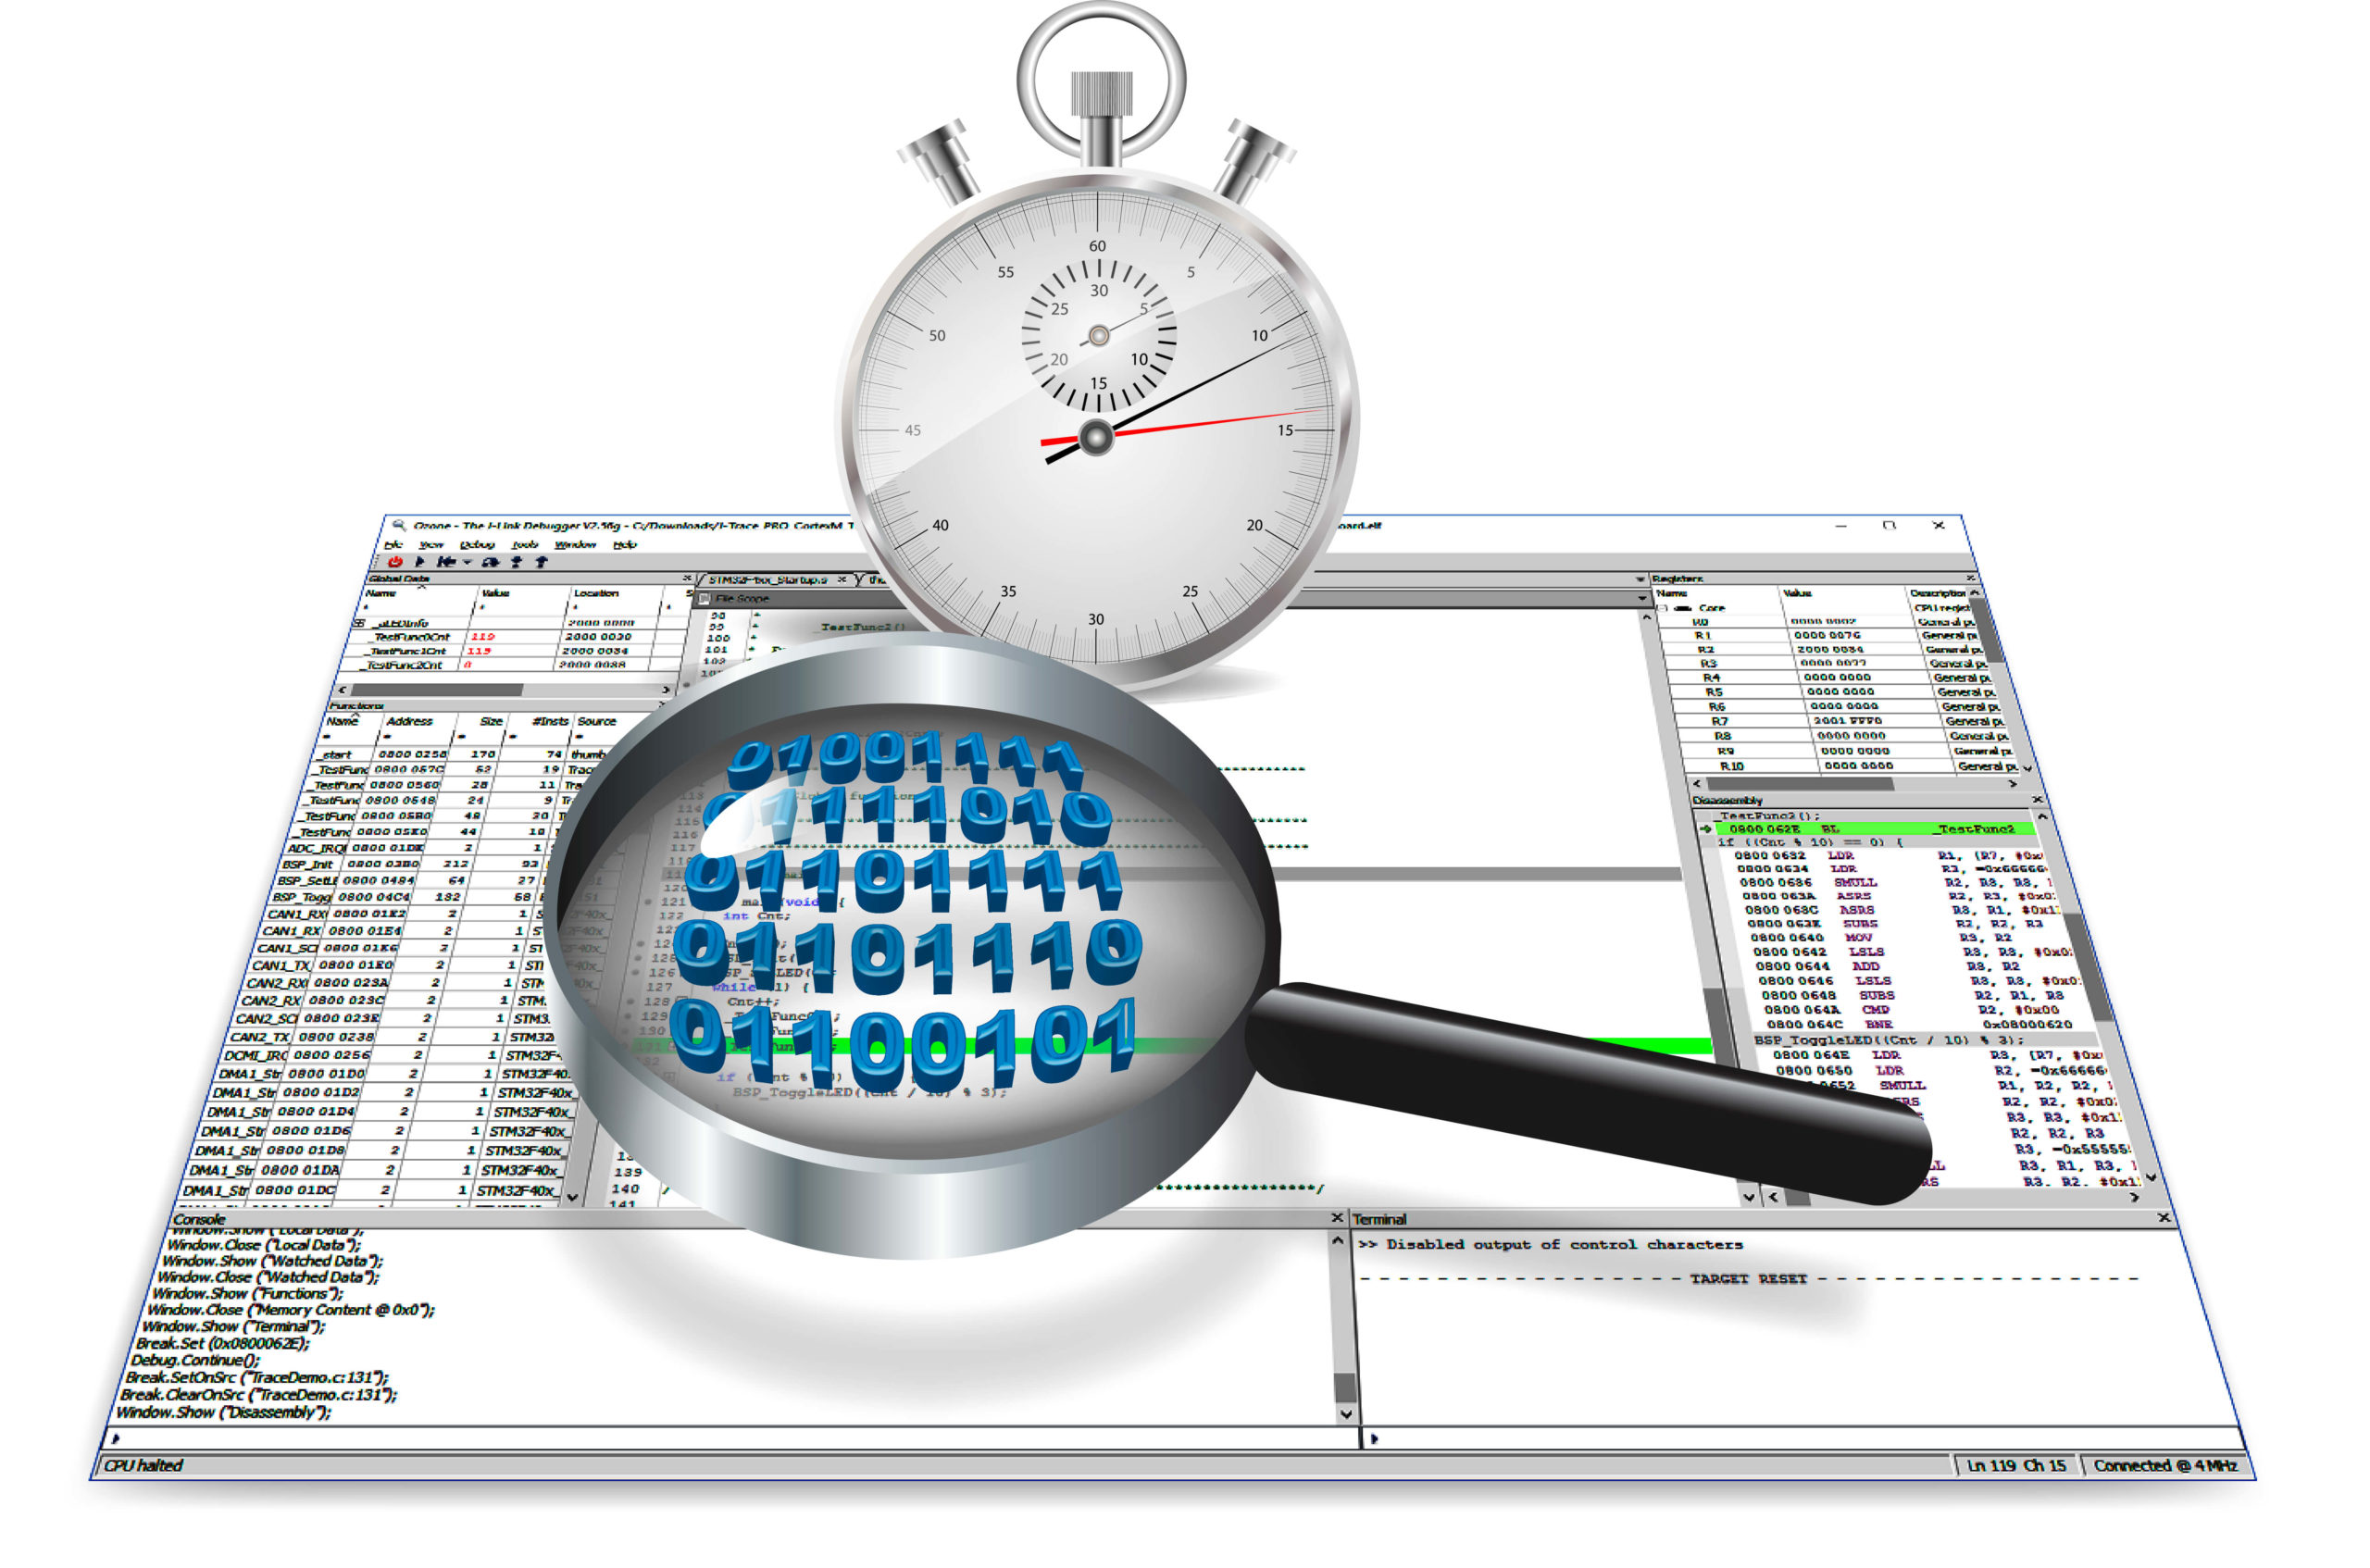 SEGGER's Ozone debugger adds support for custom instructions